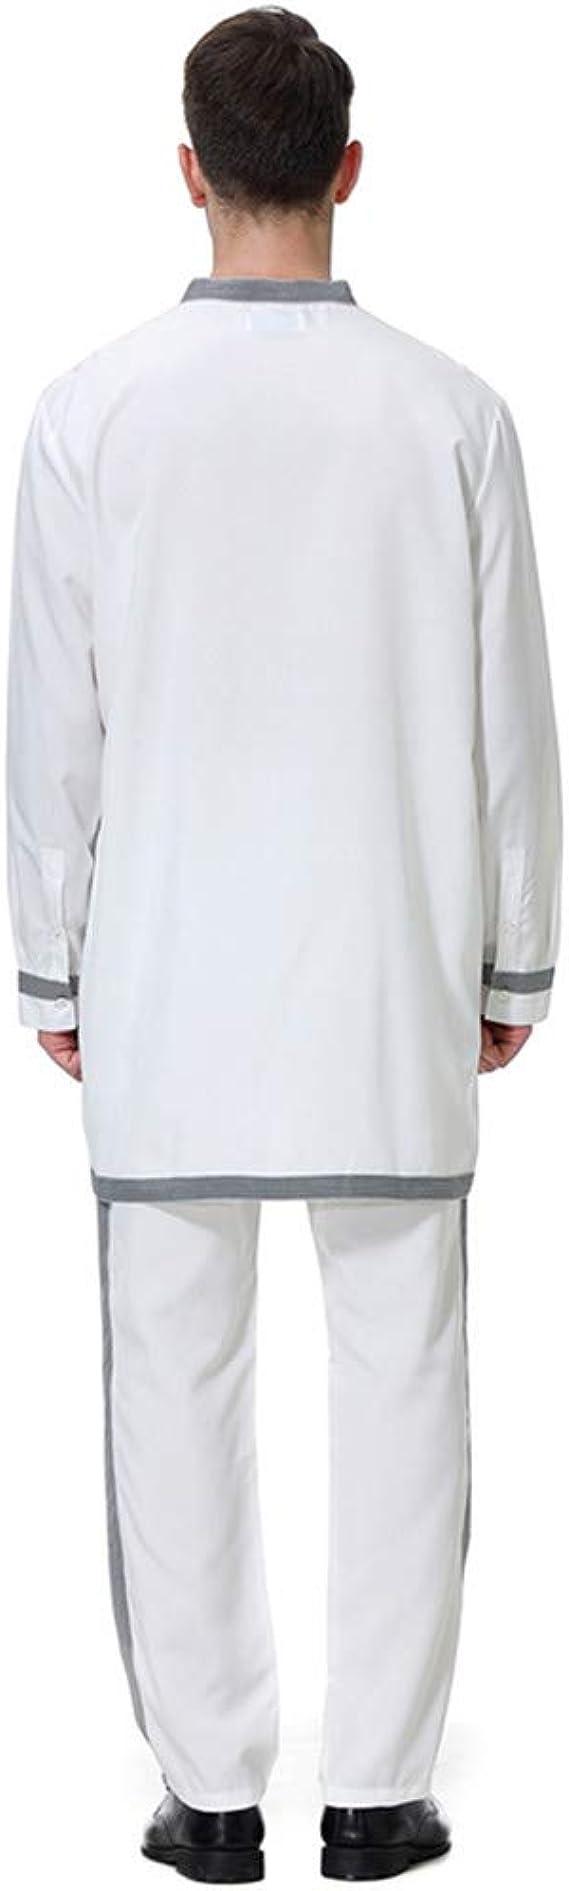 Camisas Arabes Hombre Manga Largo - Maxi Vestido Musulman Abaya Kaftan Dress Dubai Islamic Ropa: Amazon.es: Ropa y accesorios